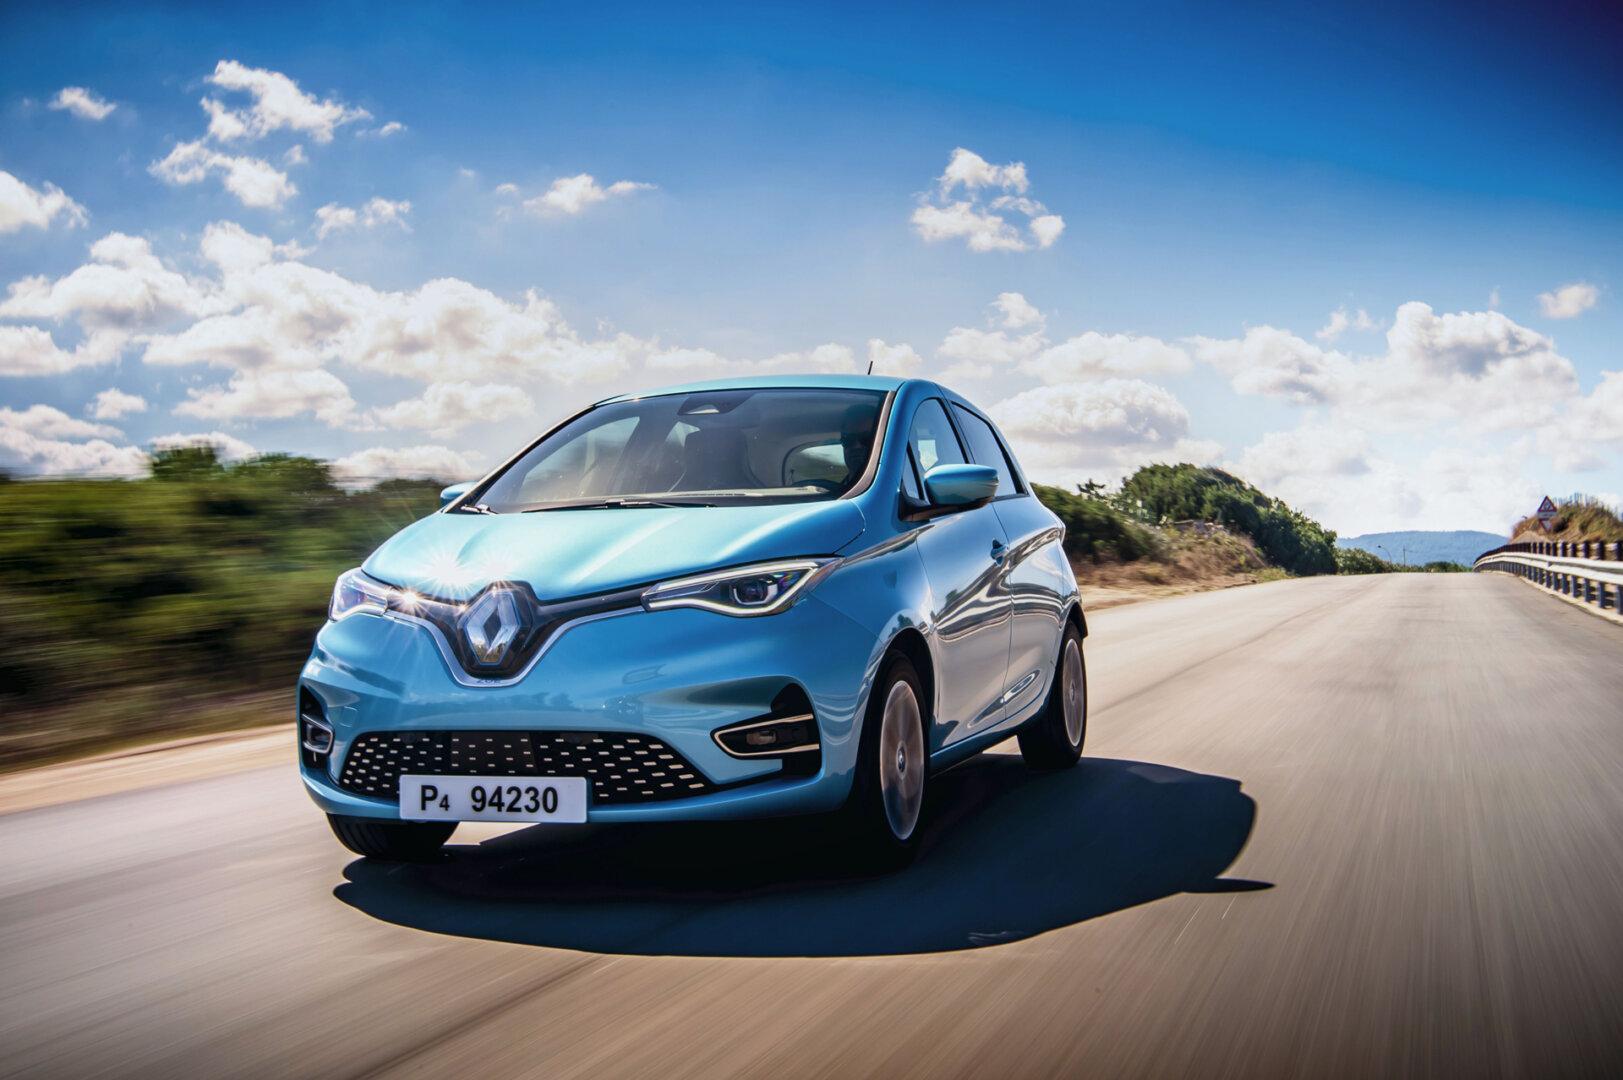 Blauer Renault Zoe Elektroauto